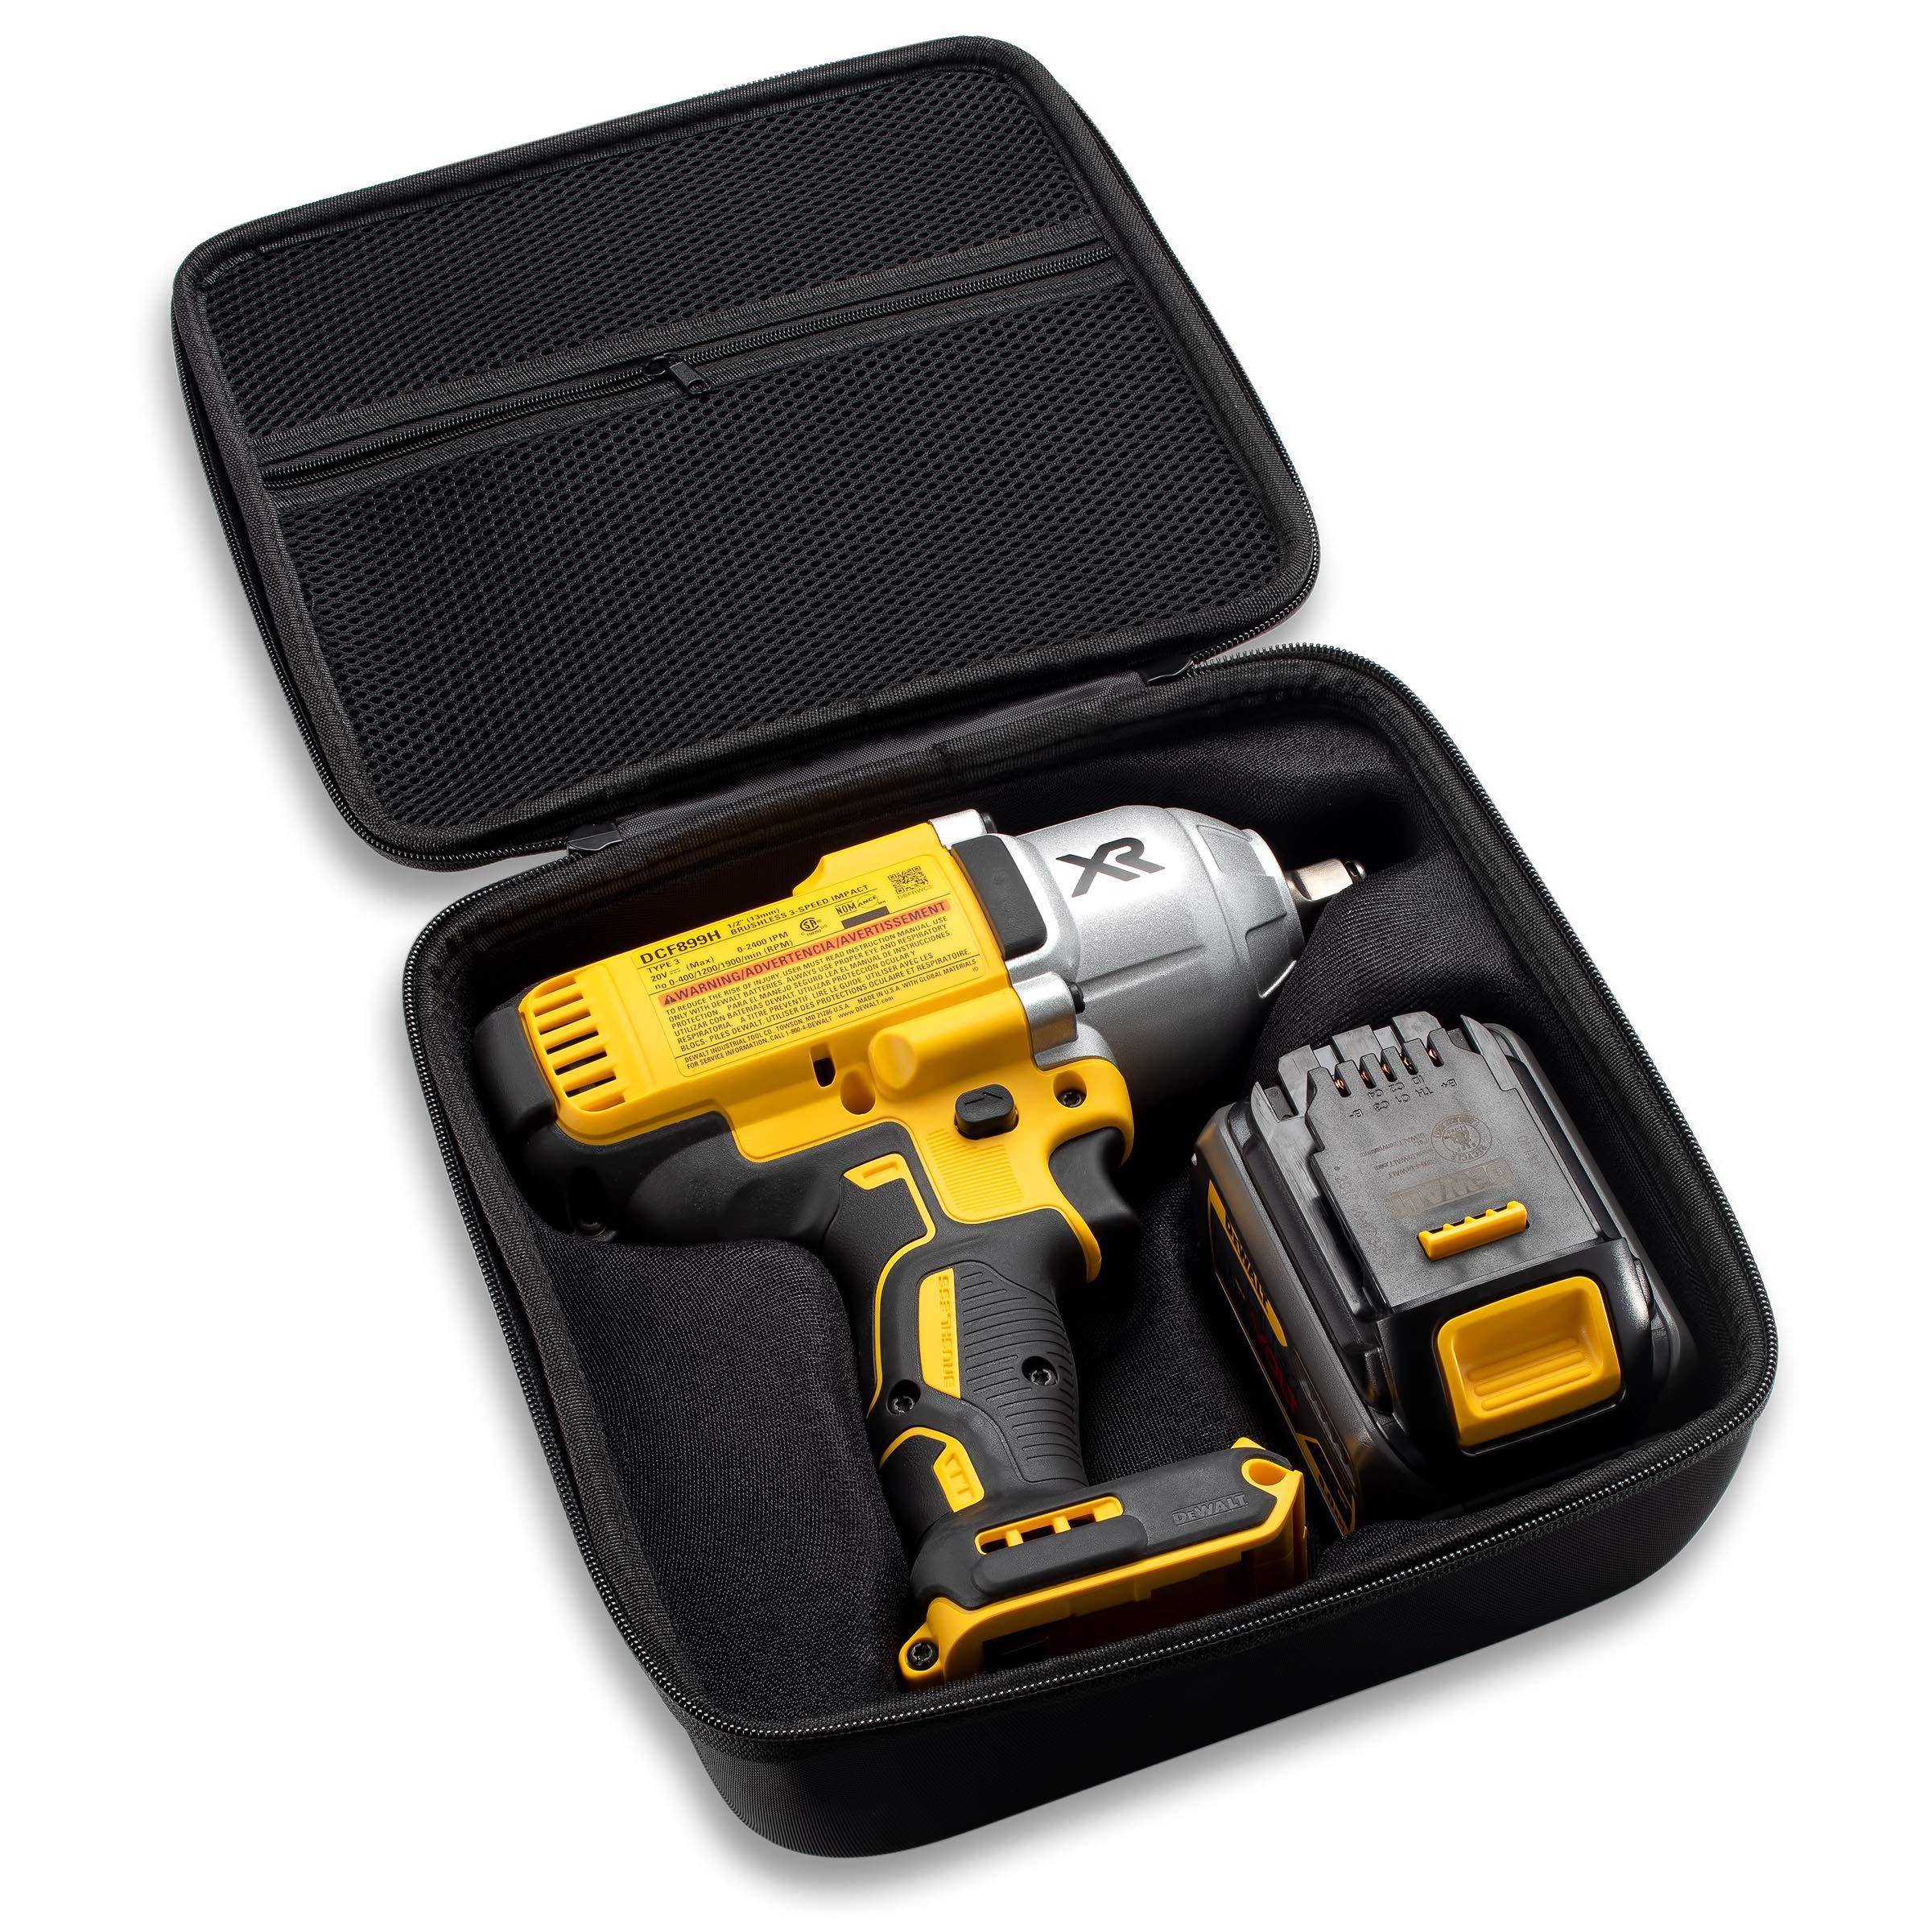 Caseling Hard Case Fits Dewalt DCF899HB / DCF899B 20V MAX XR Brushless High Torque 1/2'' Impact Wrench with Hog Ring Anvil & Battery Pack by caseling (Image #2)